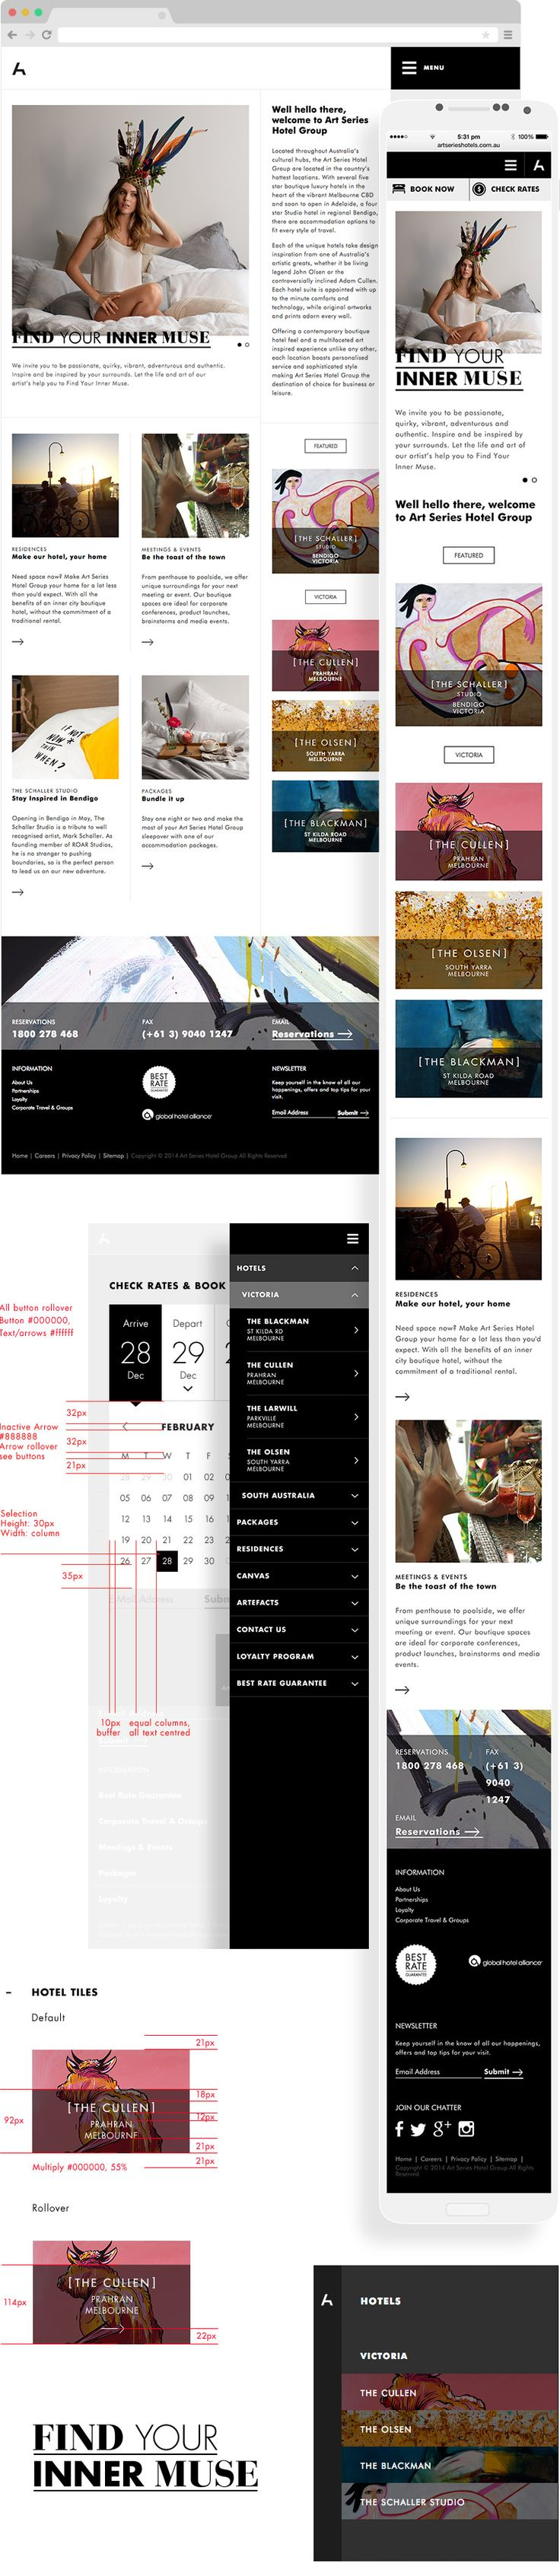 Art Series Hotel Group #UX #Responsive #Design and #Development. Multi-Site - Carter Digital